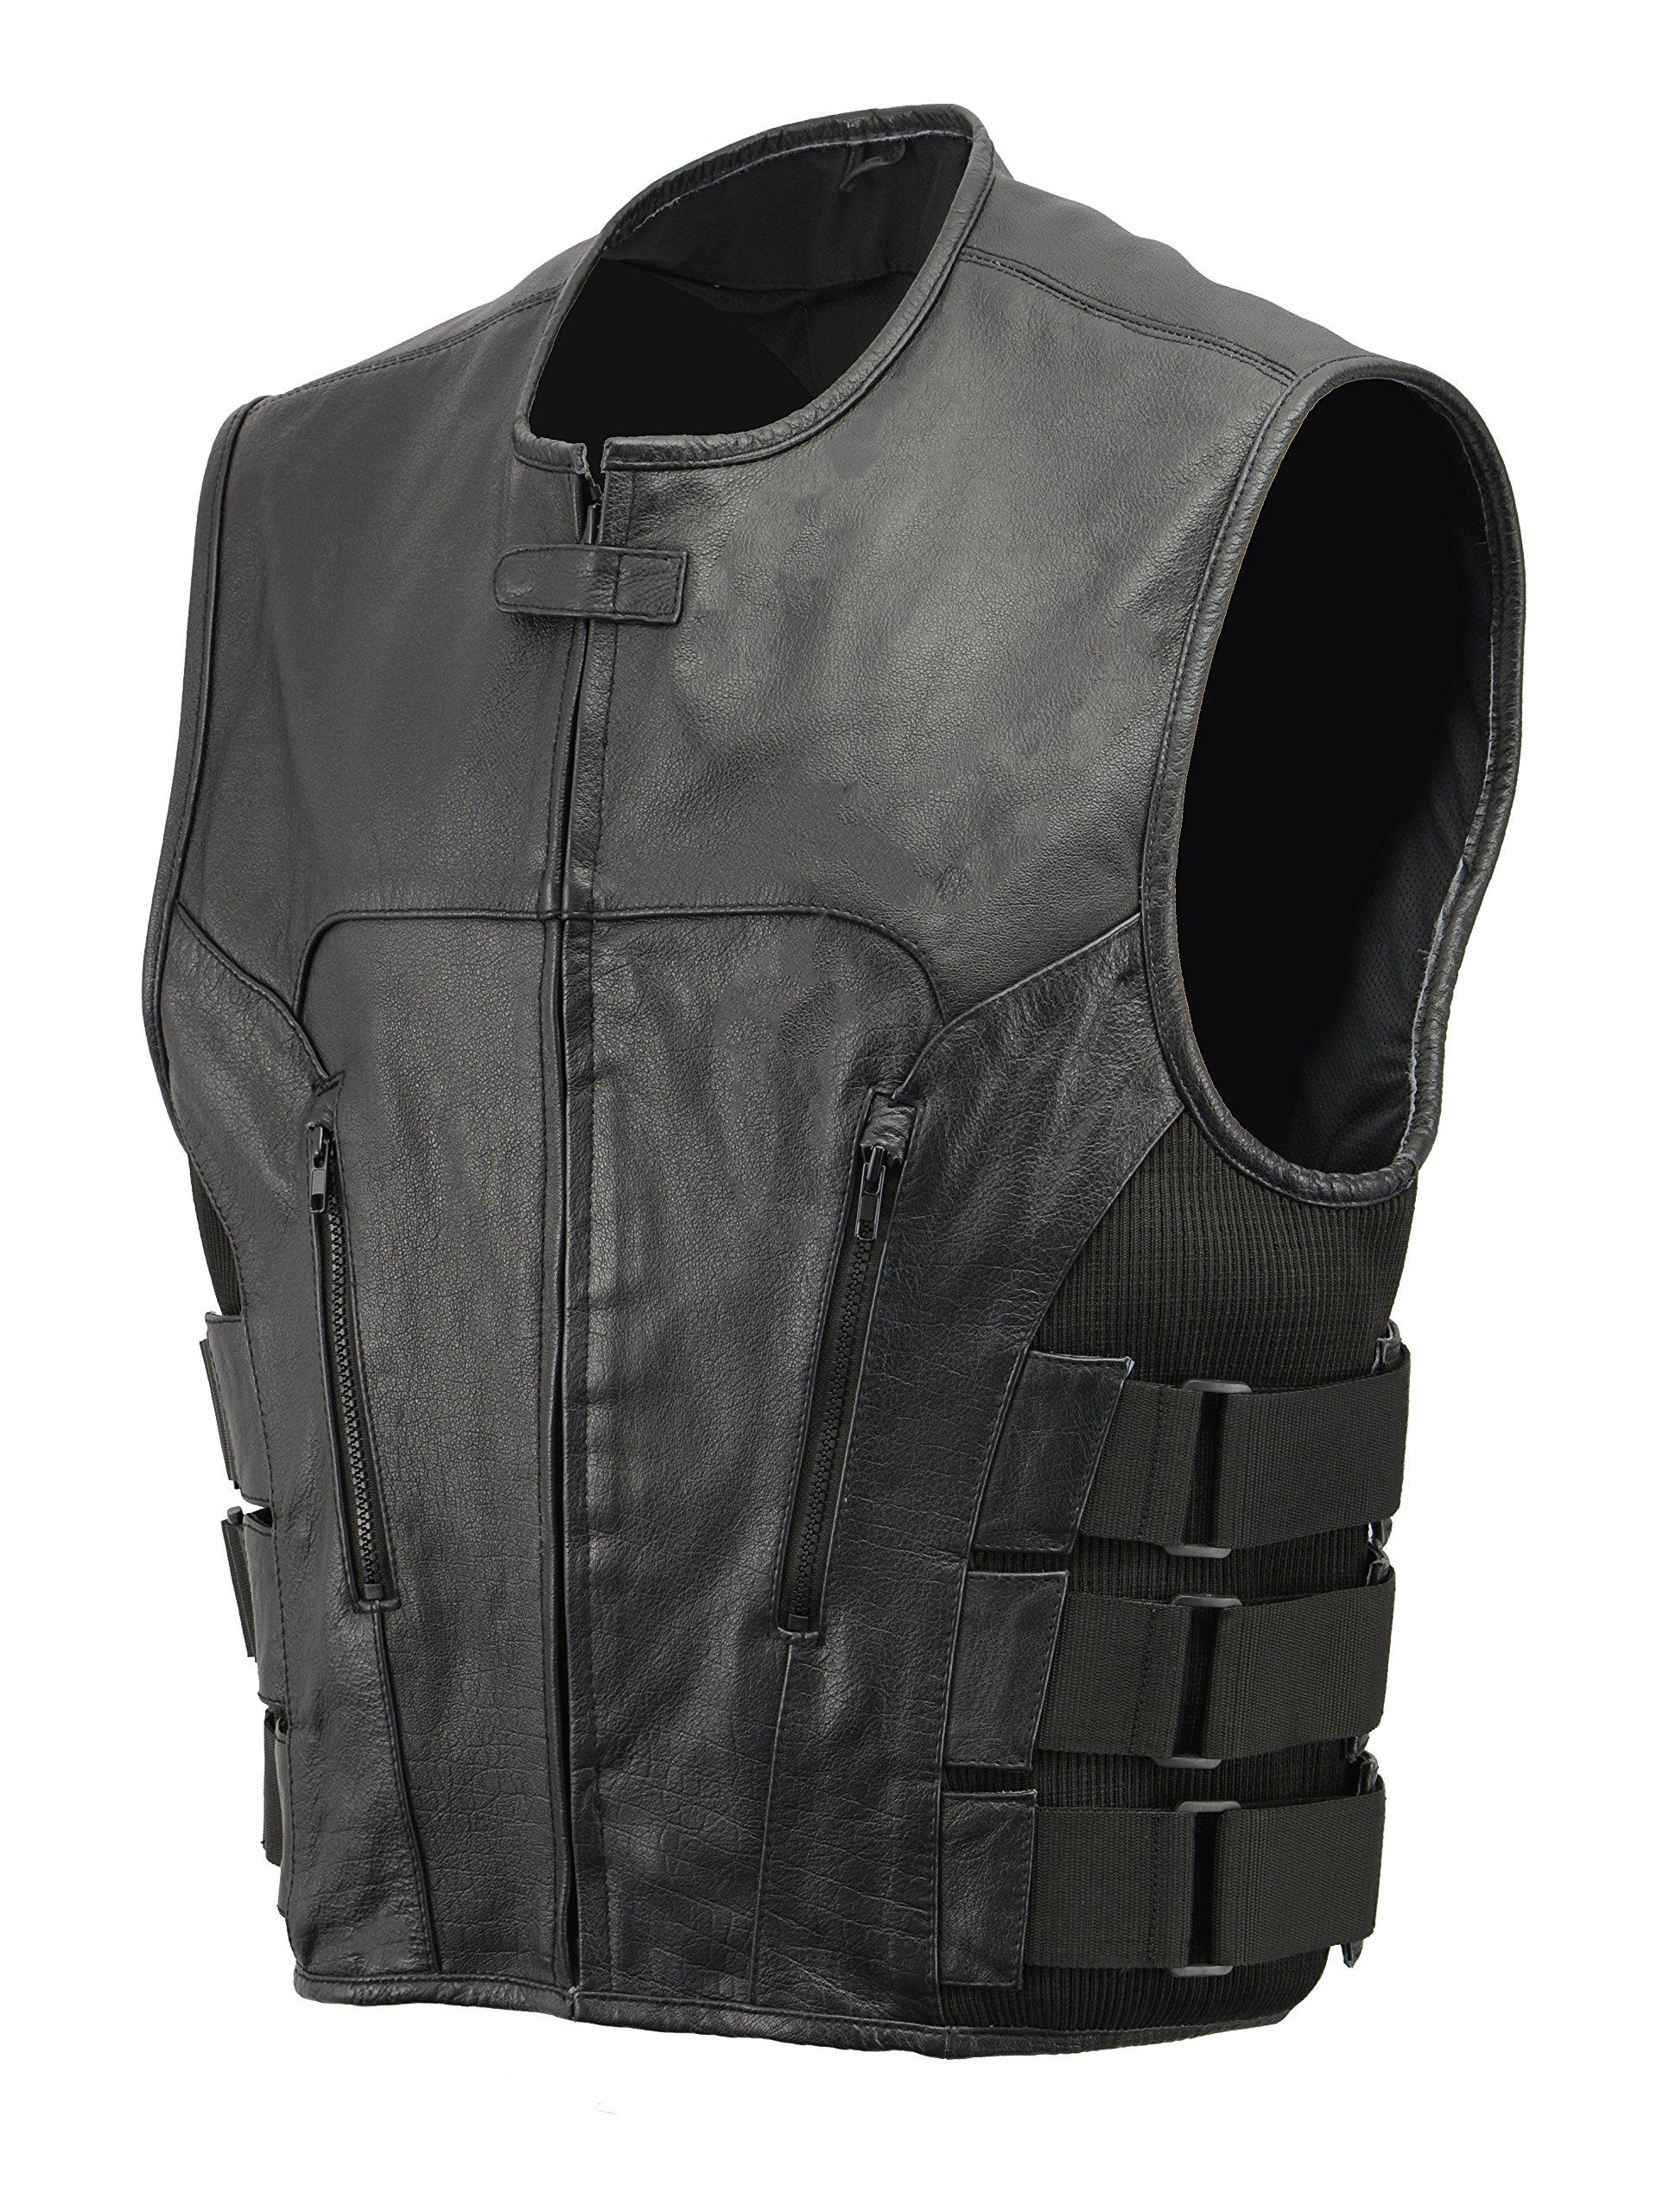 Men's Leather SWAT Style Vest | Premium Natural Buffalo Leather | Patch Access Lining, New Outseam Gun Pocket, Adjustable Side Straps, Zipper Front Closure | Black Biker Vest (Black, 3X-Large)